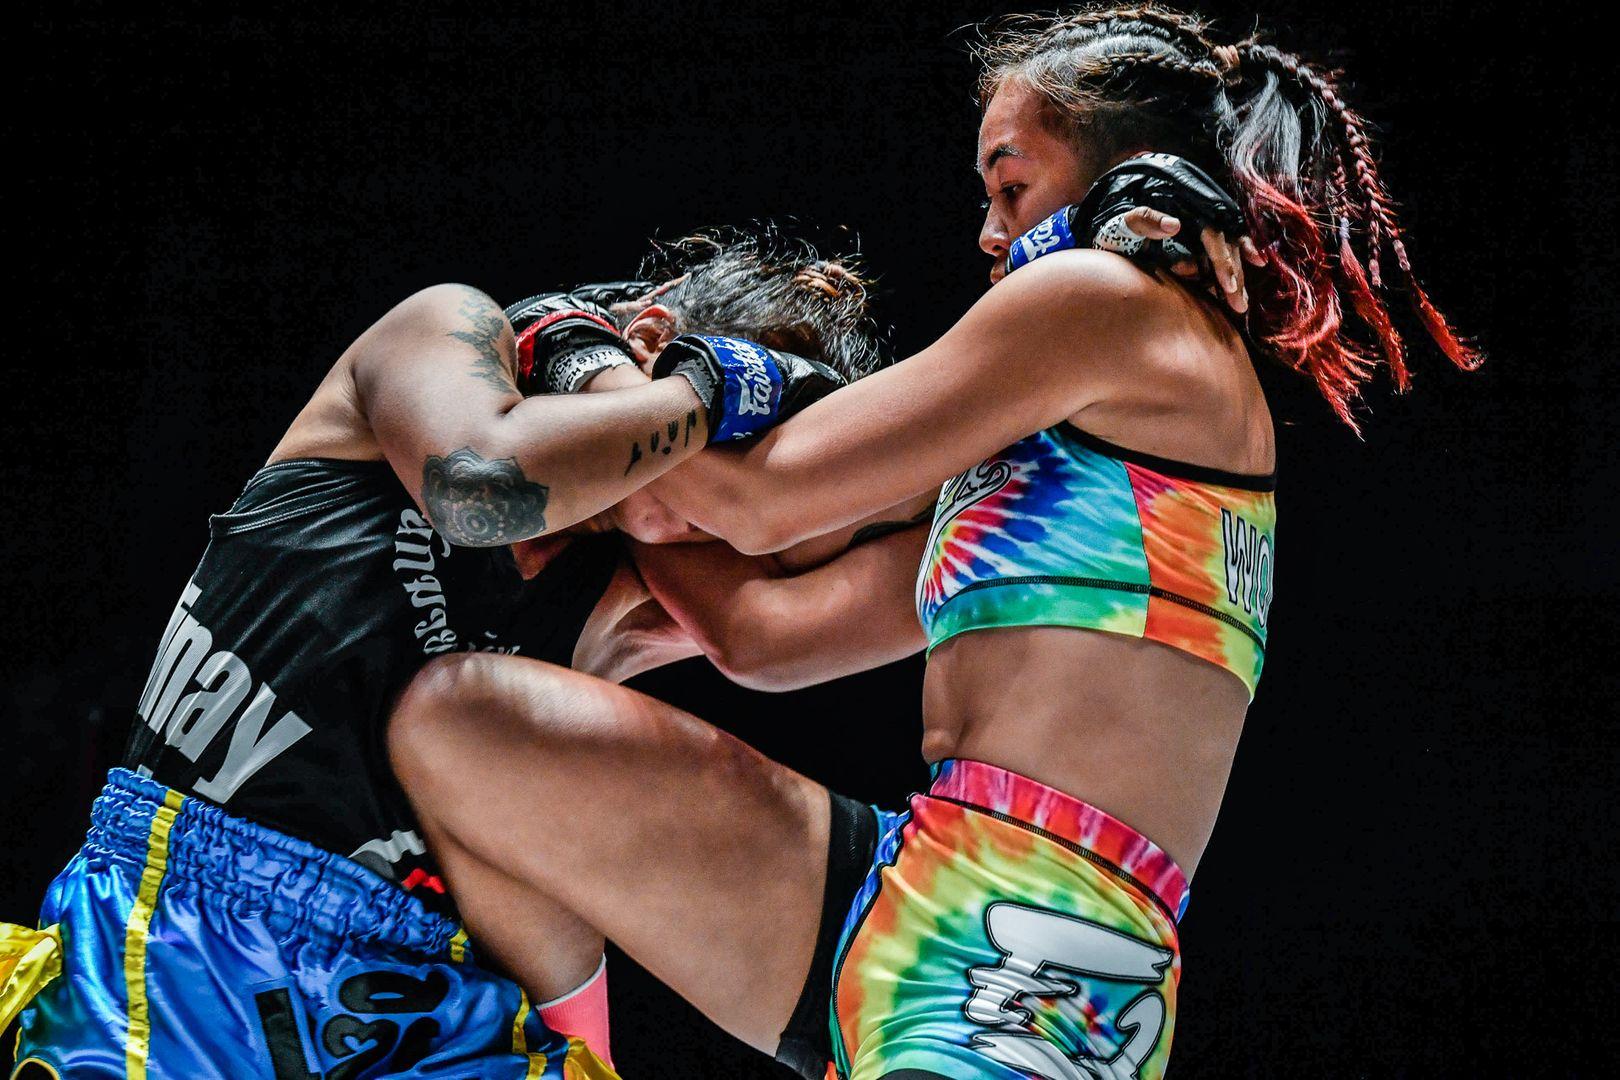 Muay Thai fighter Wondergirl Fairtex throws her knee into KC Carlos' ribs